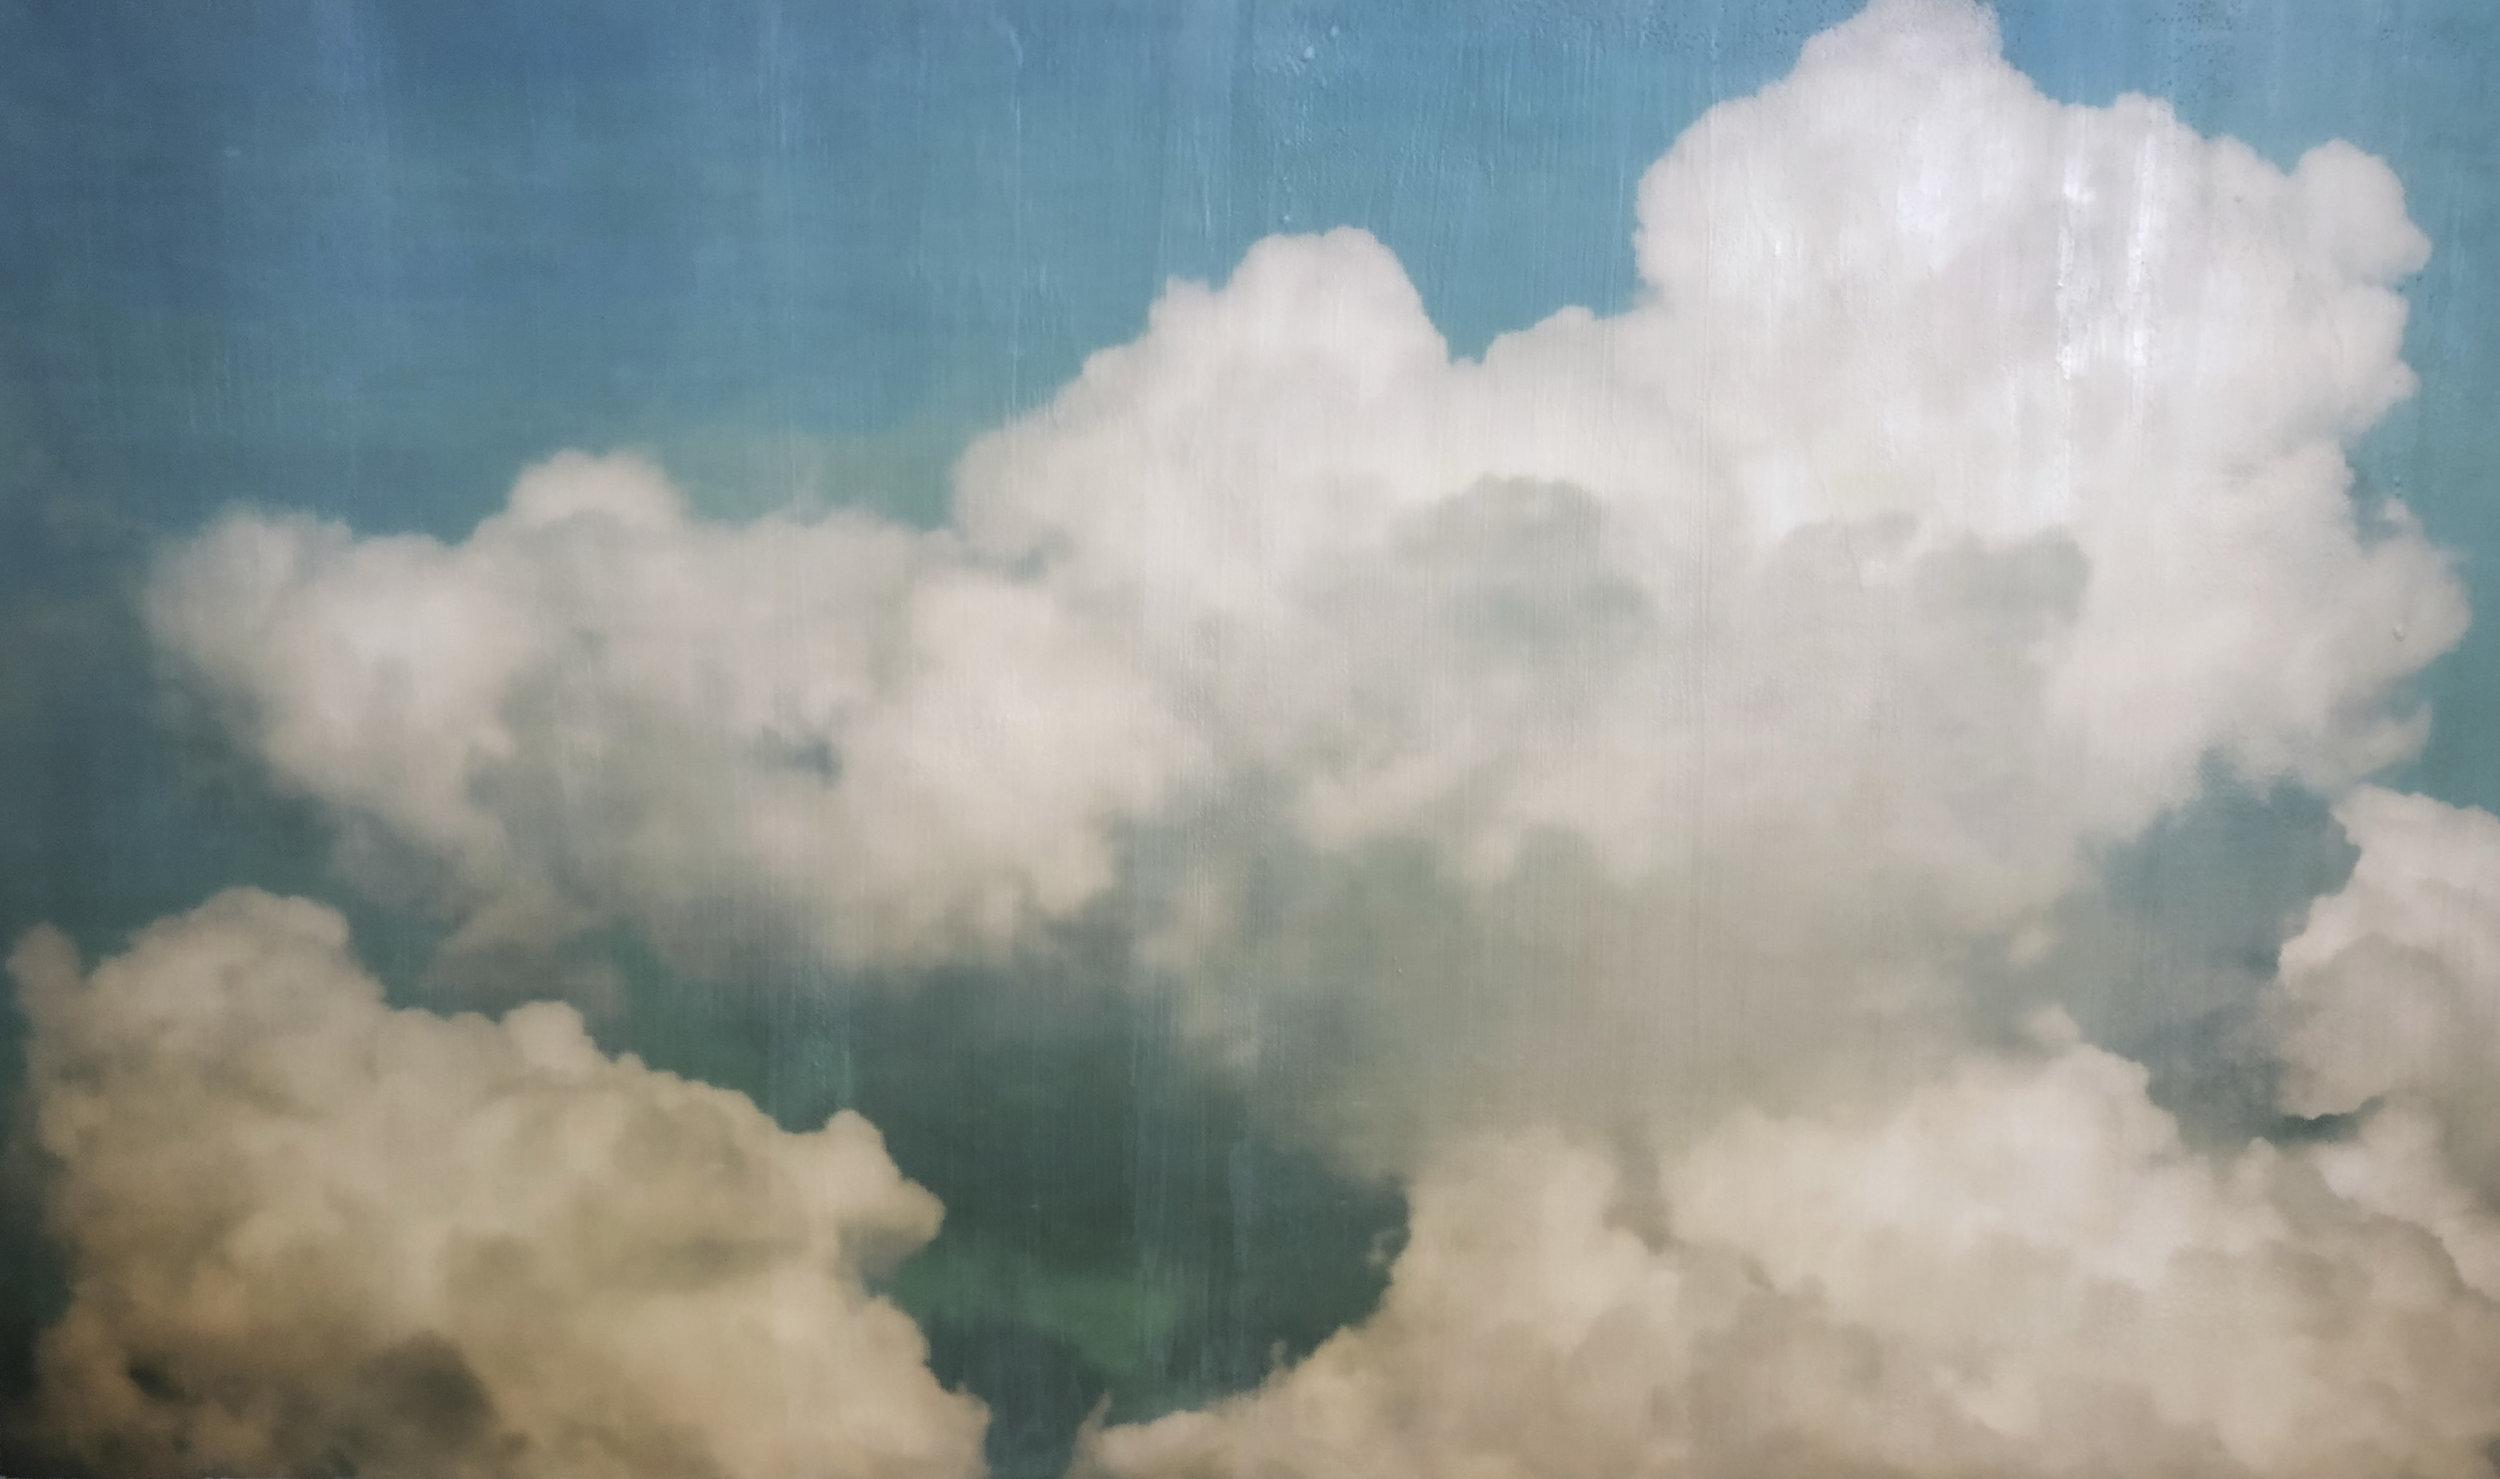 cloud study 6136x60 inches.JPG